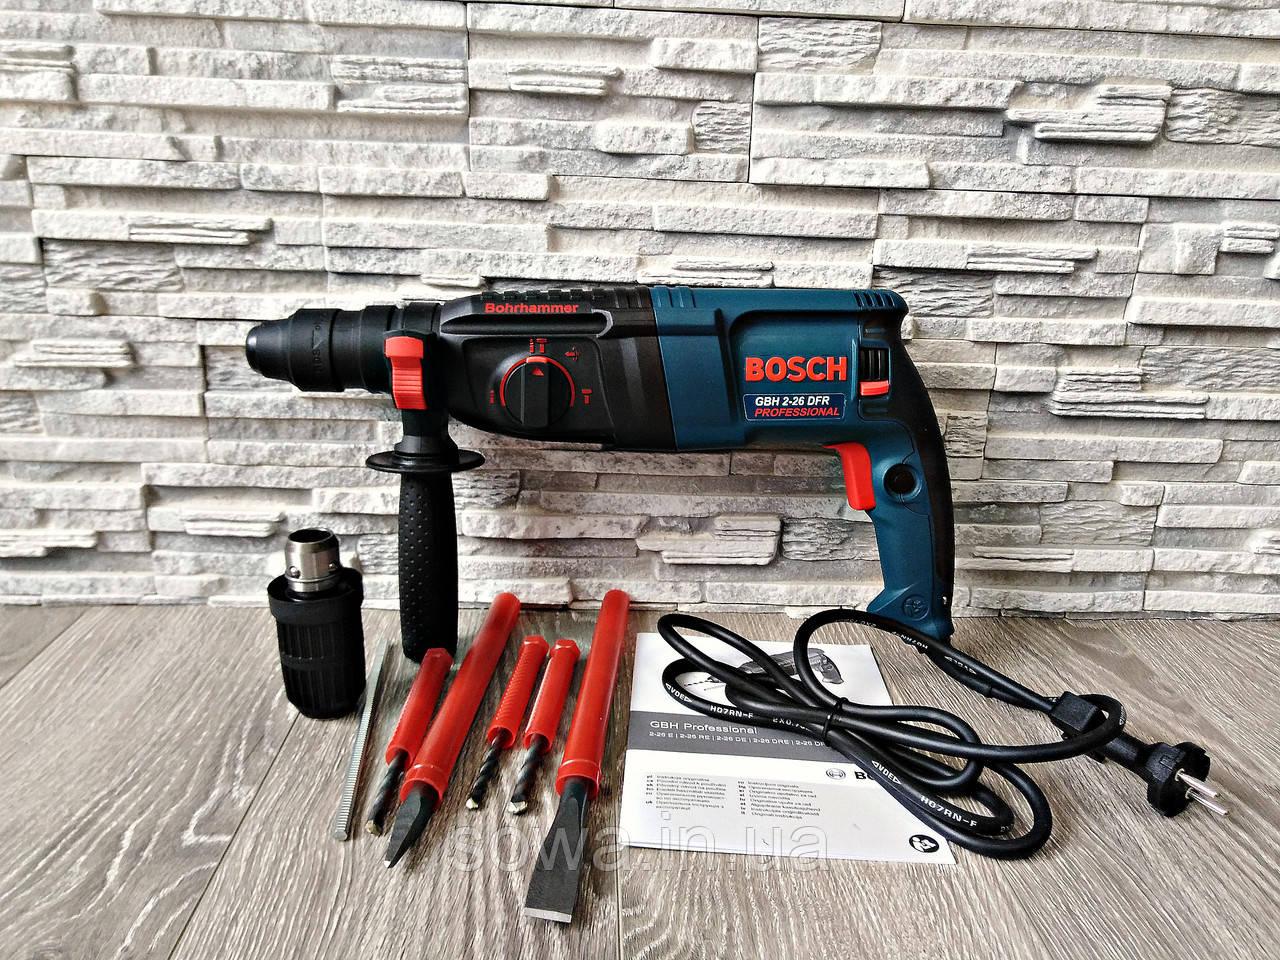 ✔️ Перфоратор Bosch GBH 2-26 DRE   SDS-Plus